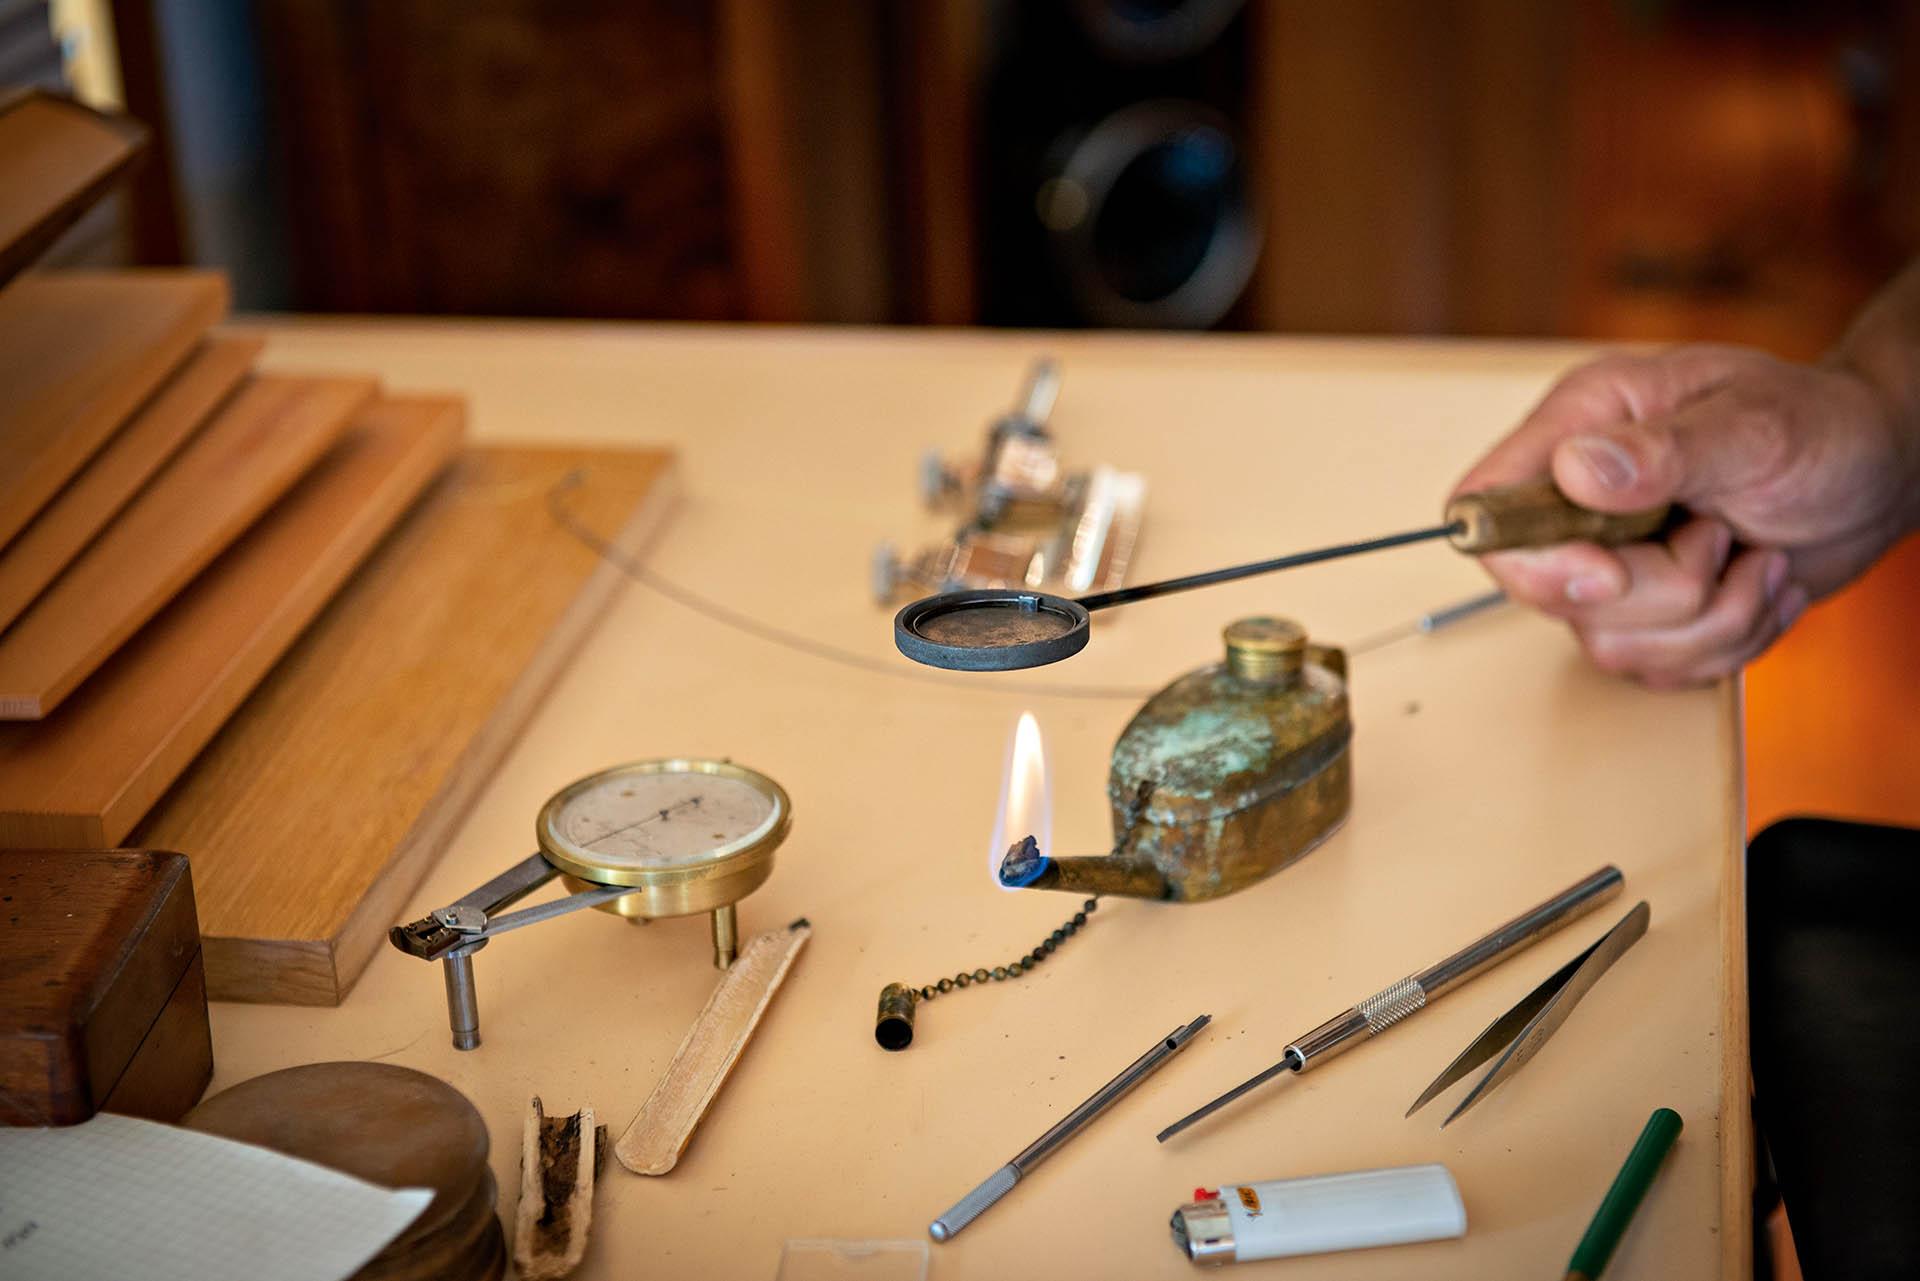 Manufaktur Audemars Piguet in Le Brassus